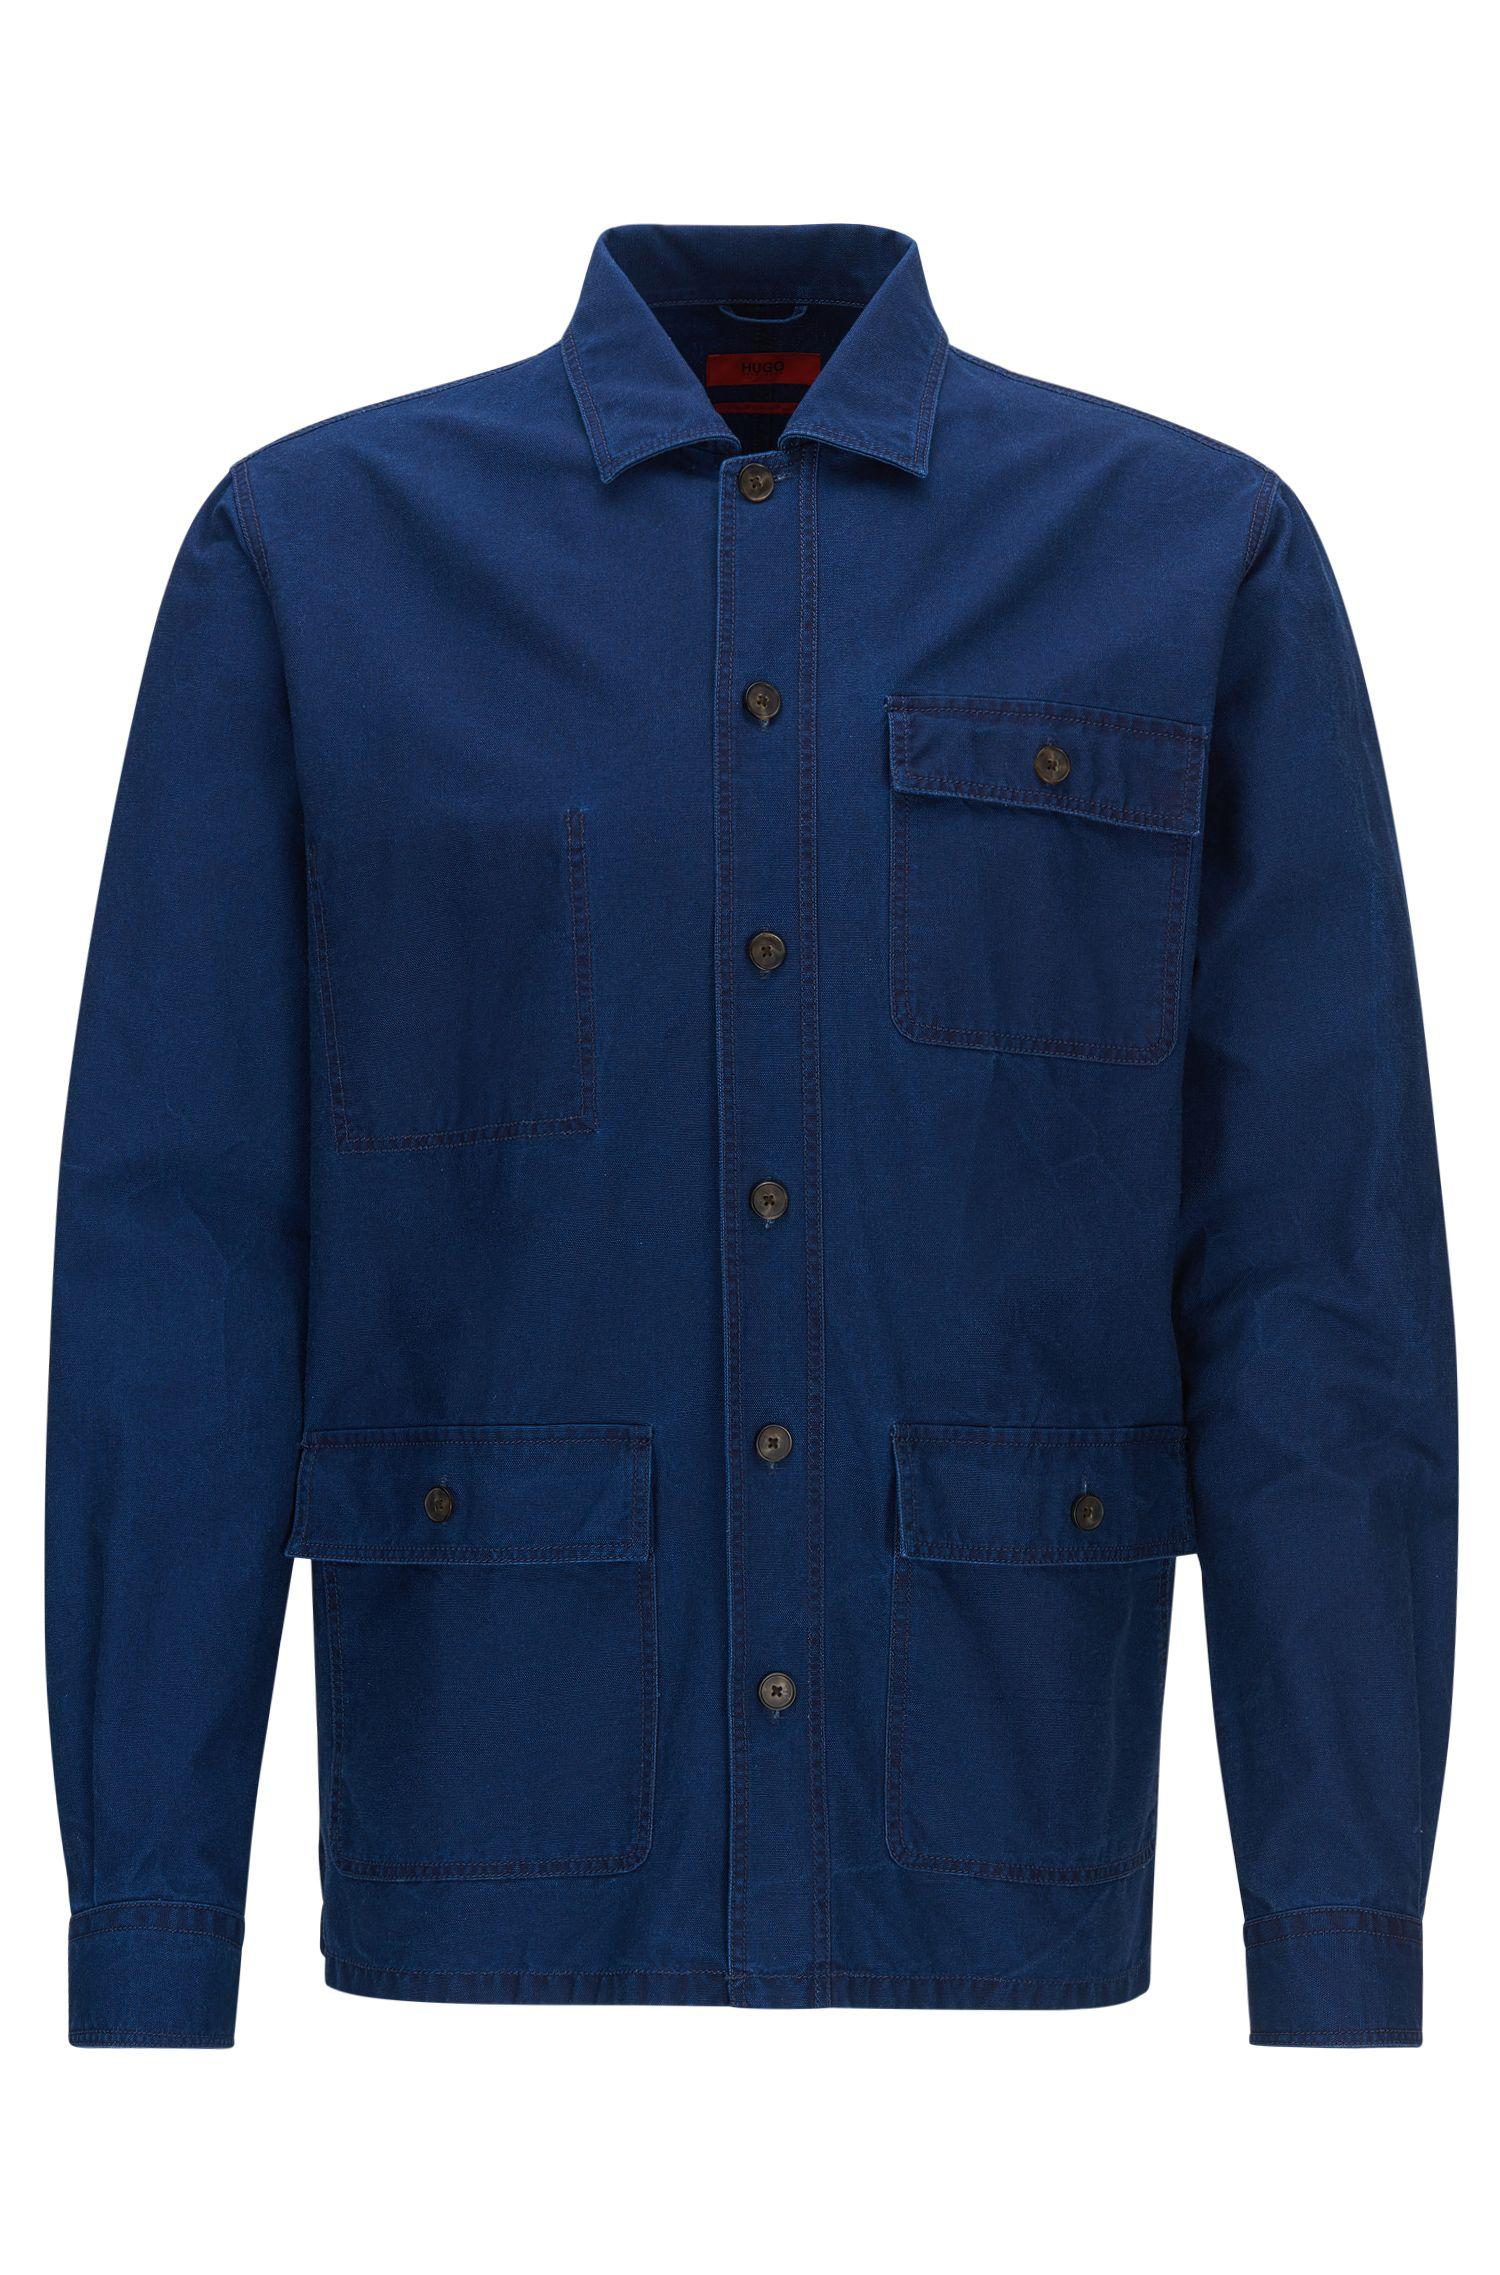 Cotton Denim Shirt Jacket, Relaxed Fit | Emilius